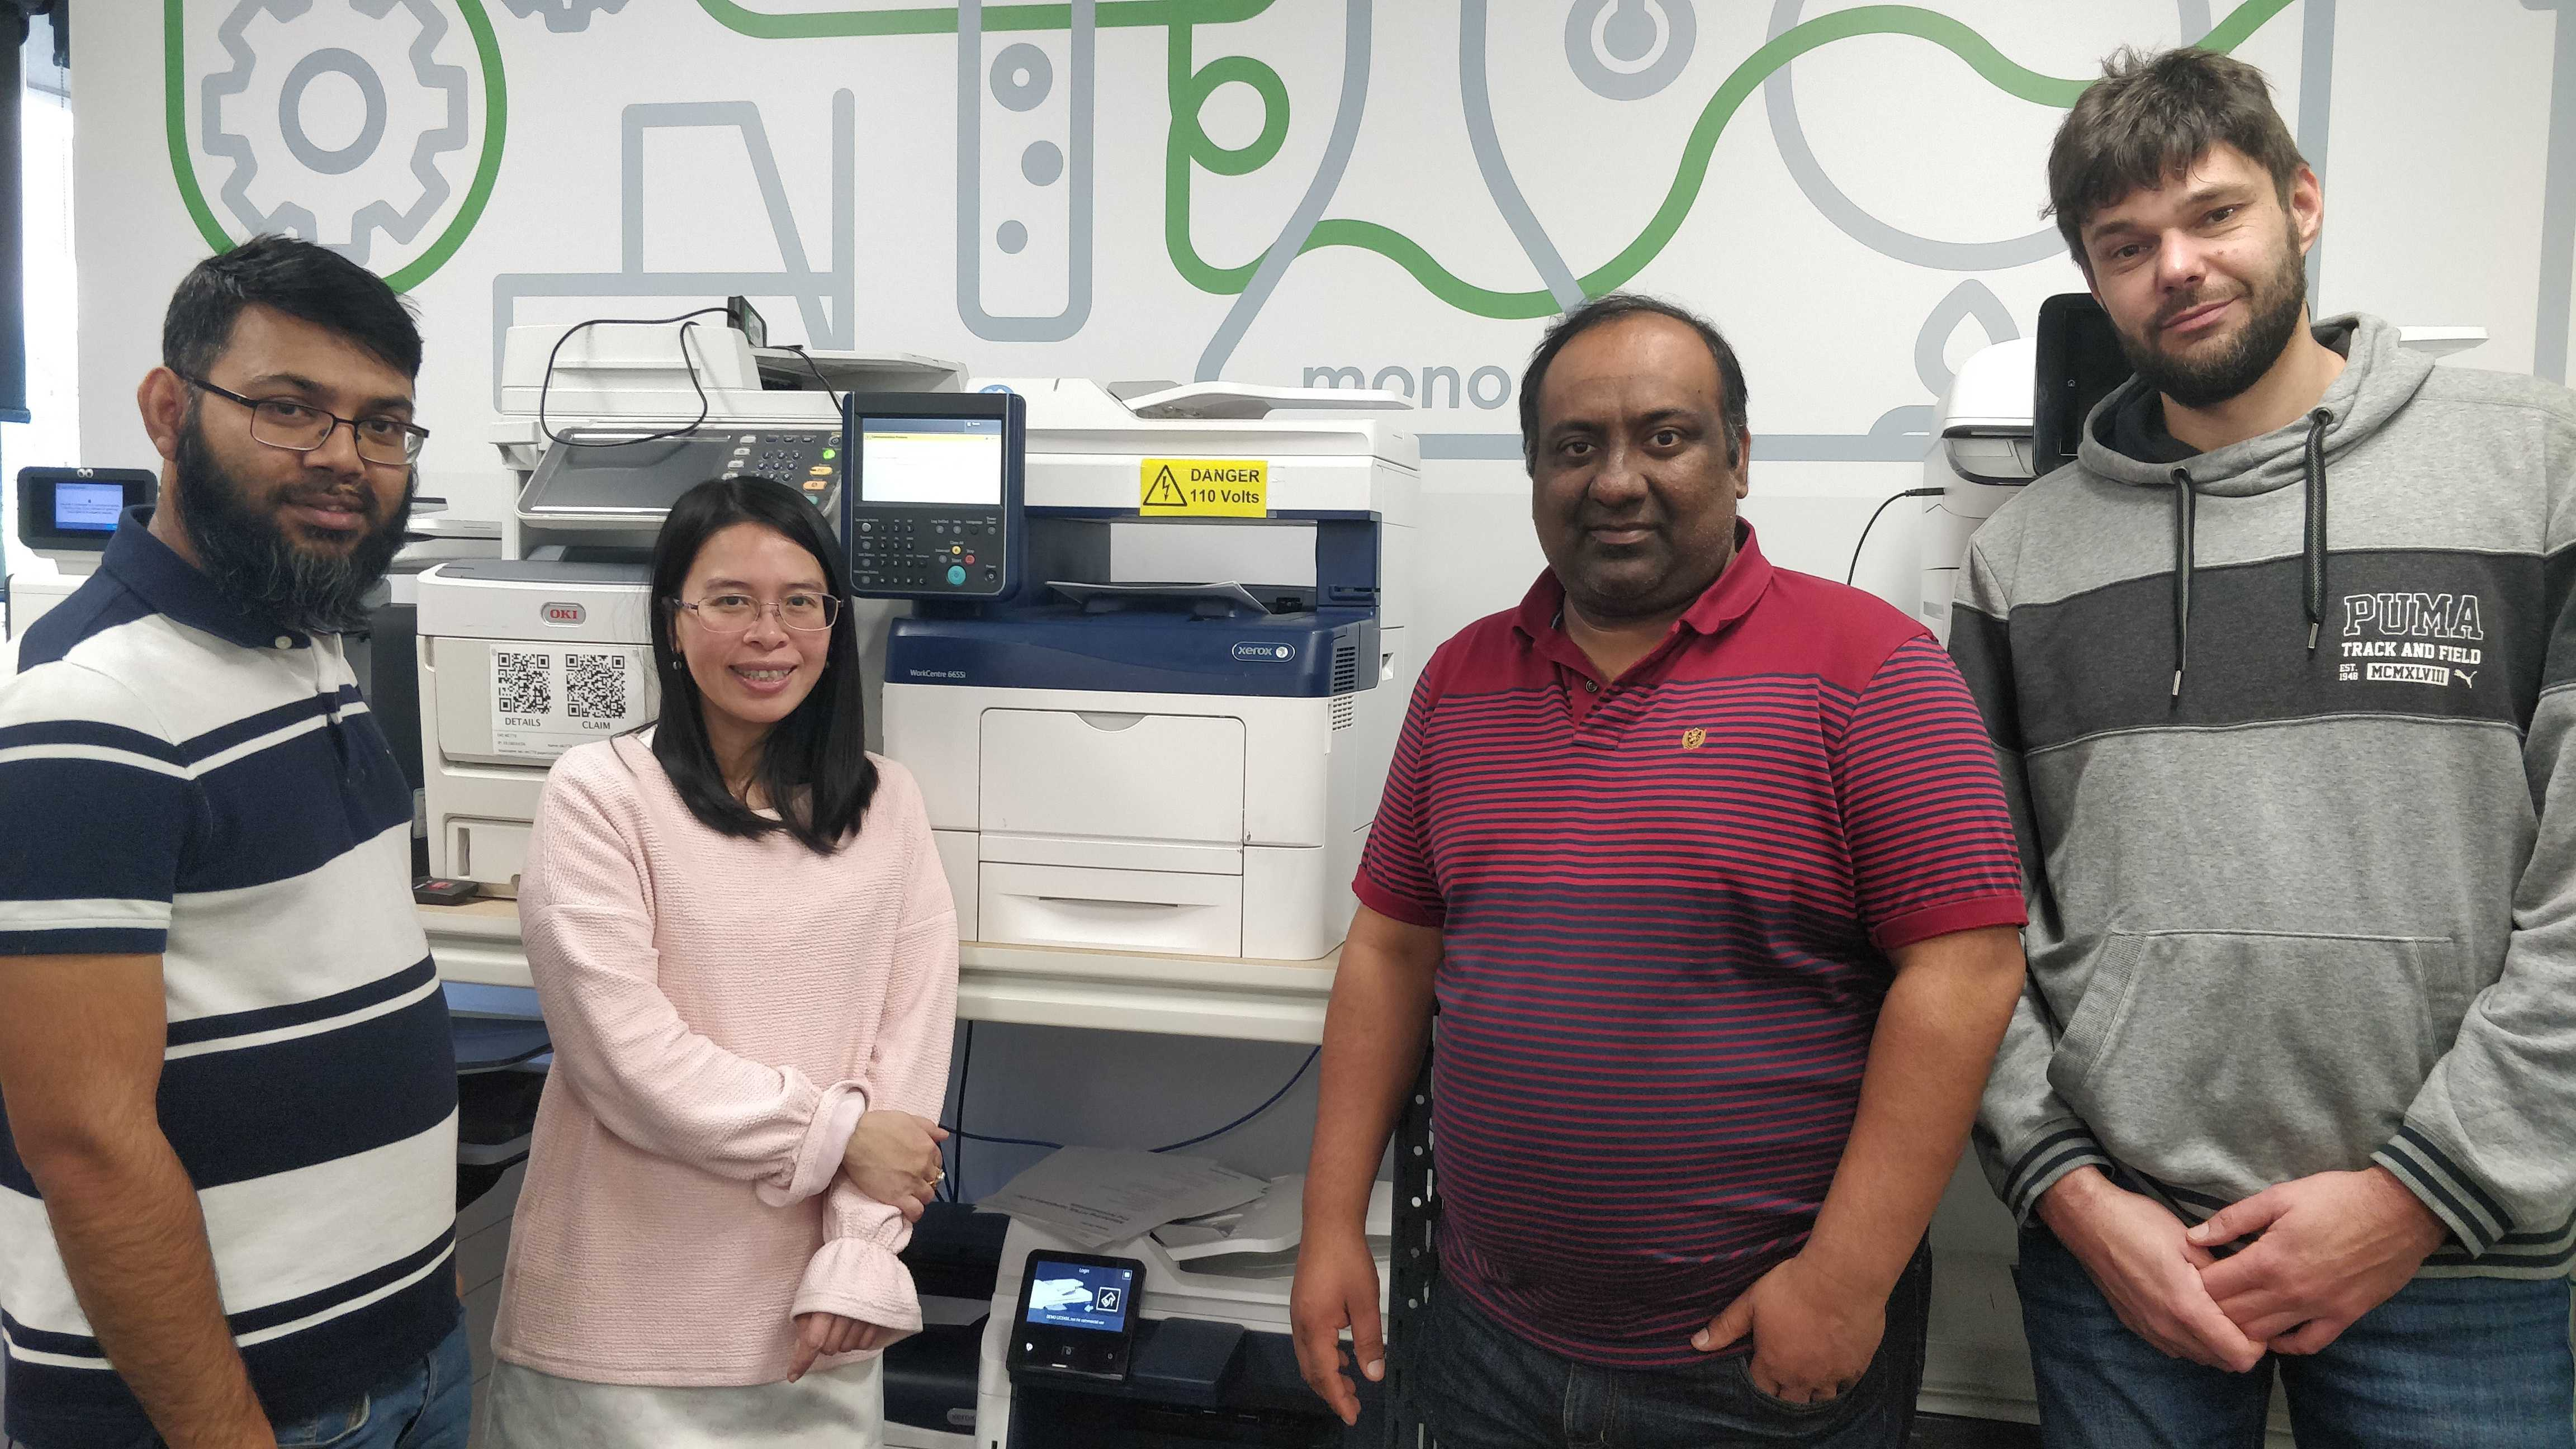 Photo of the PaperCut Hive Xerox team members